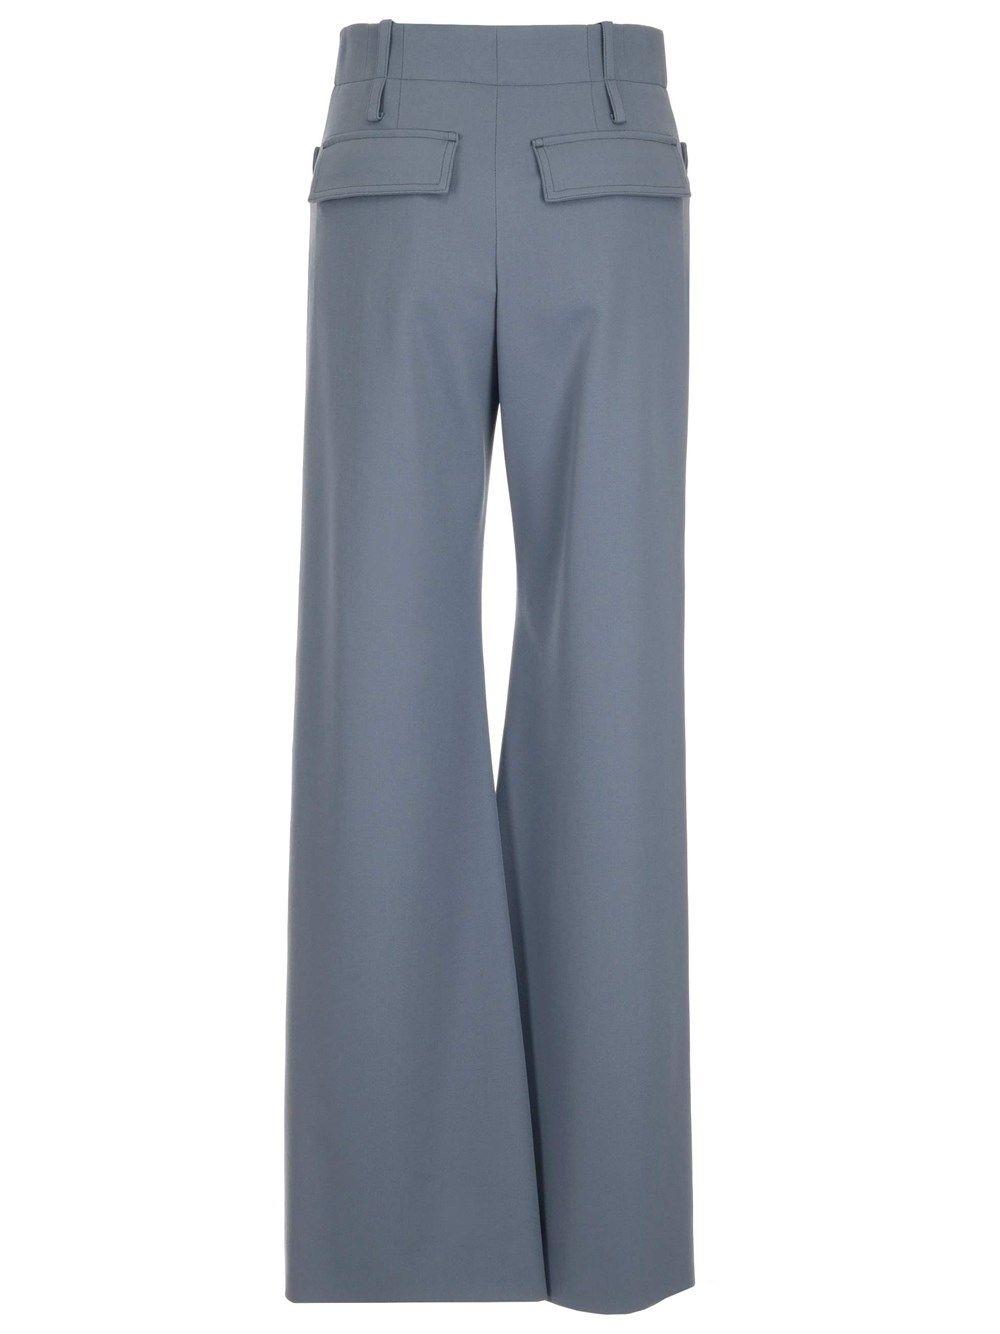 CHLOÉ Pants CHLOÉ WOMEN'S LIGHT BLUE OTHER MATERIALS PANTS